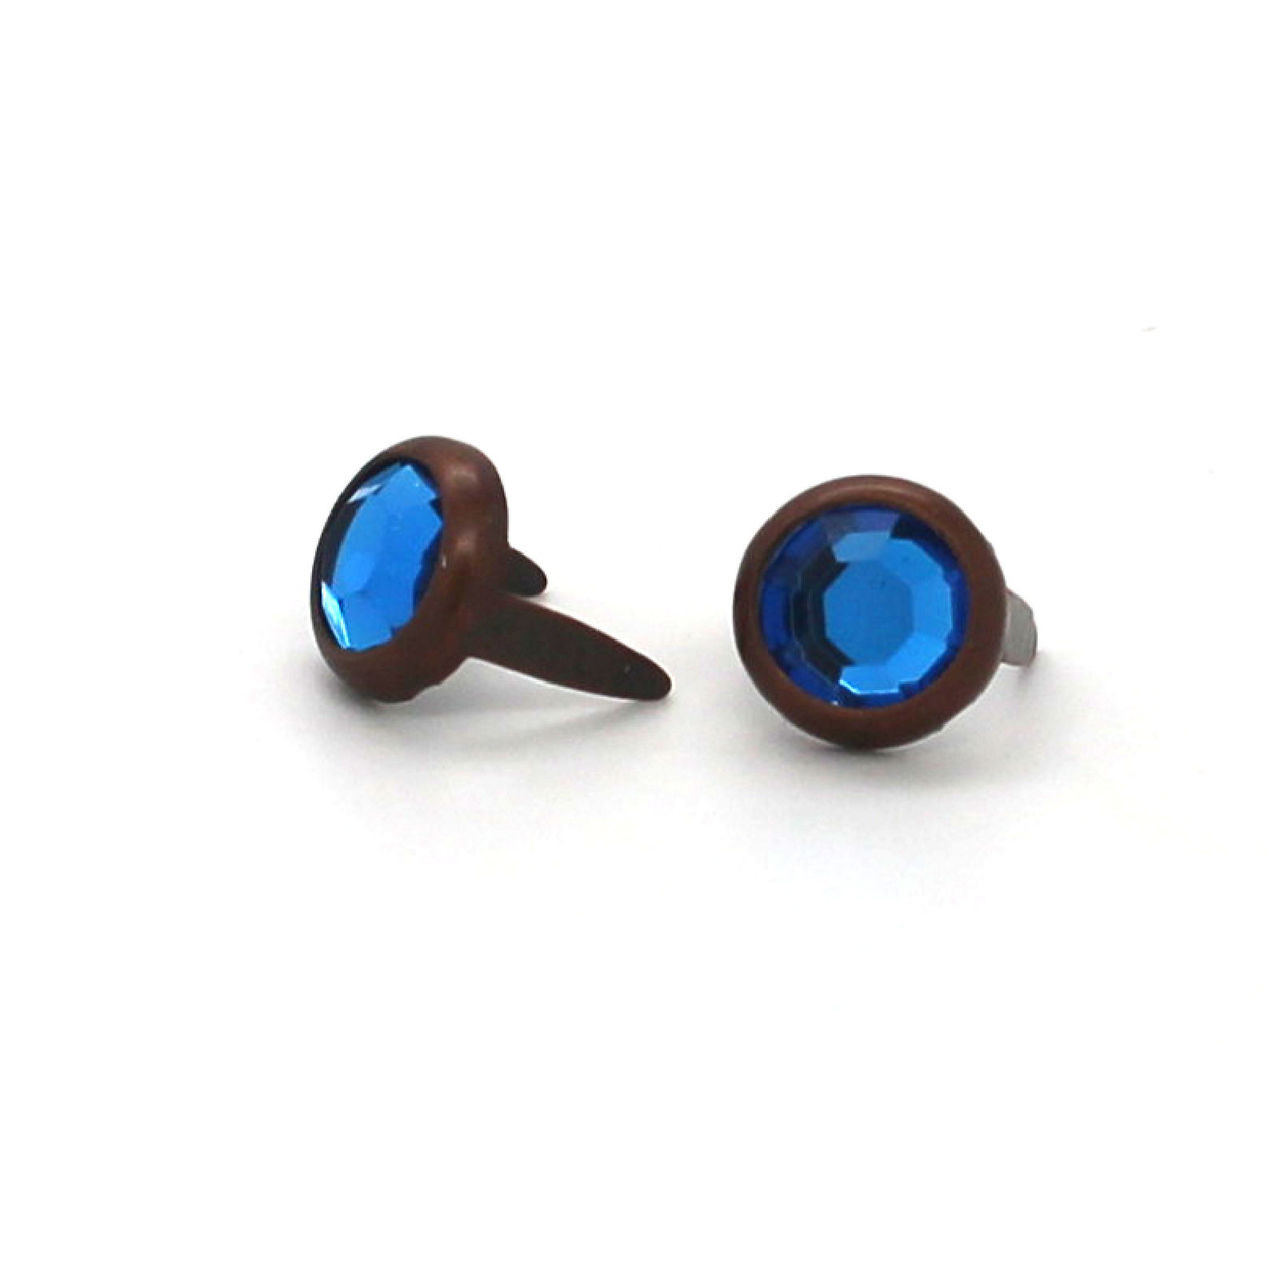 "Blue Rhinestone Copper Plated Brass Spots 10 pk 5/16"" Diameter"